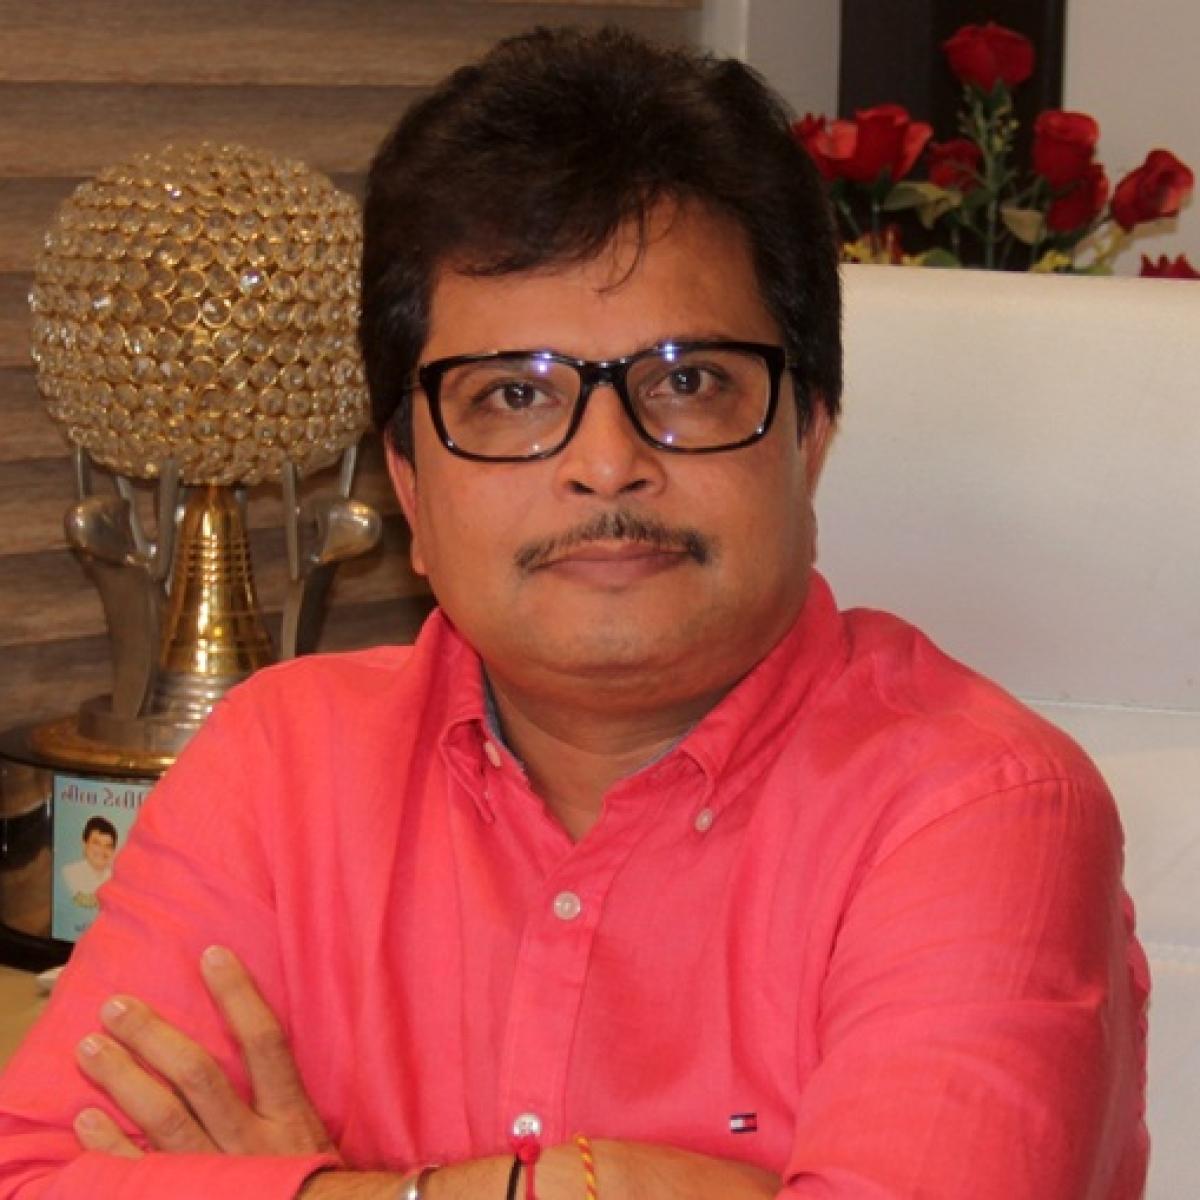 'Govt could've handled the matter differently': 'Taarak Mehta Ka Ooltah Chashmah' producer on shoot ban